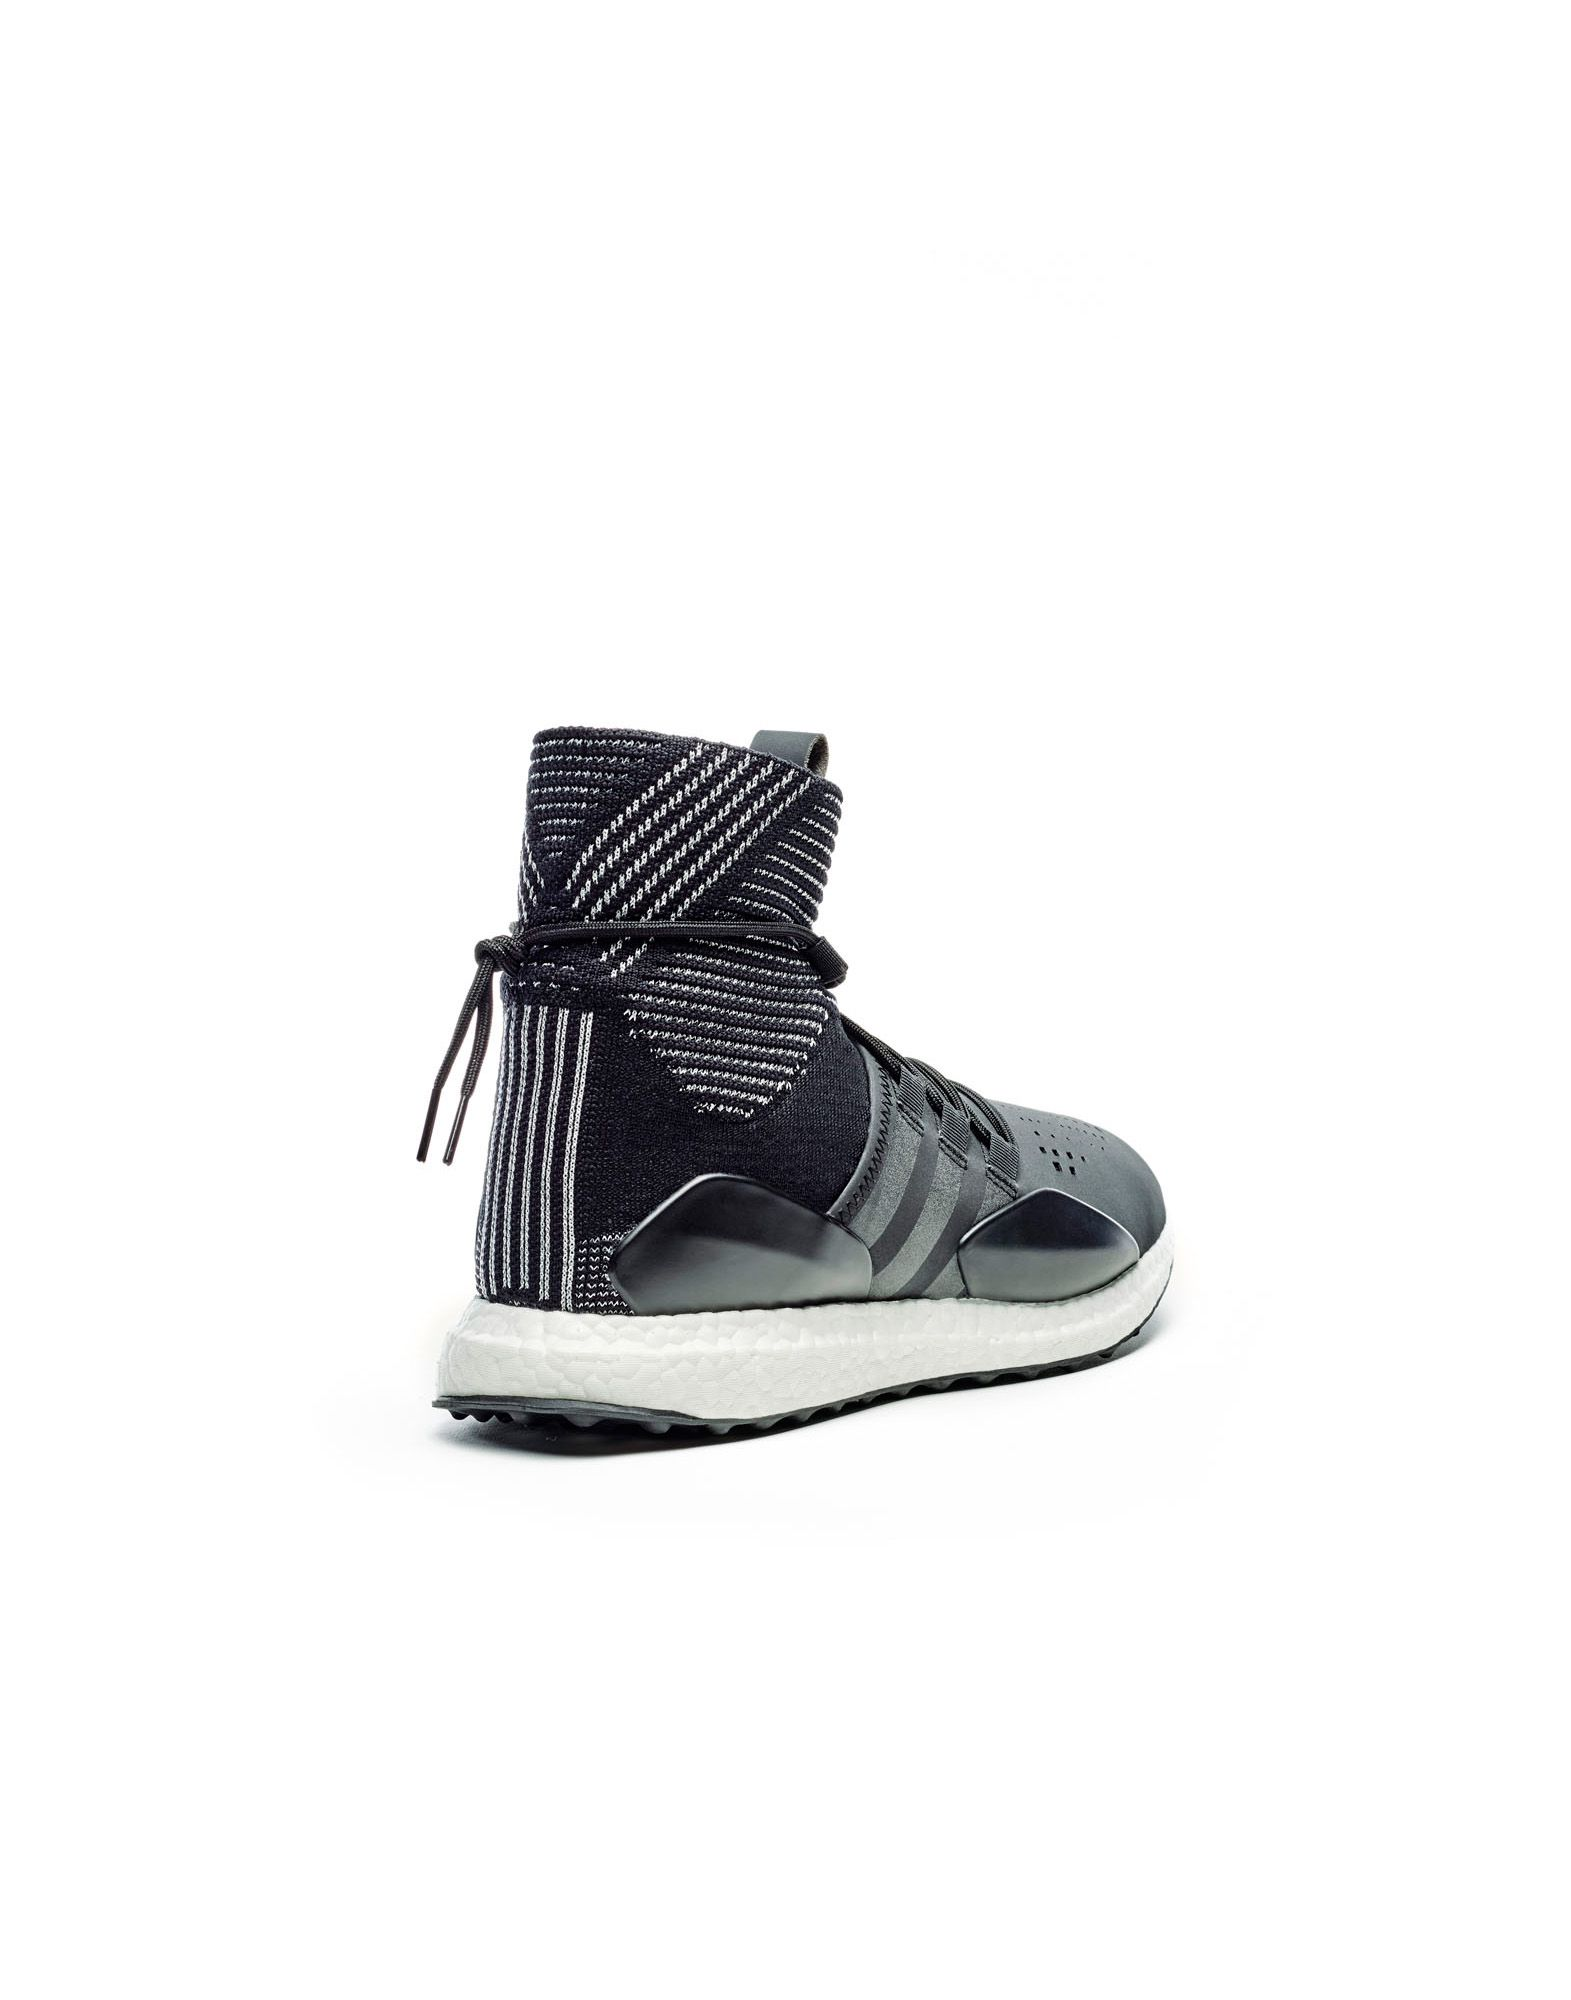 ... Y-3 SPORT Y-3 SPORT APPROACH REFLECT High-top sneakers Man r ... fe8f48582a59